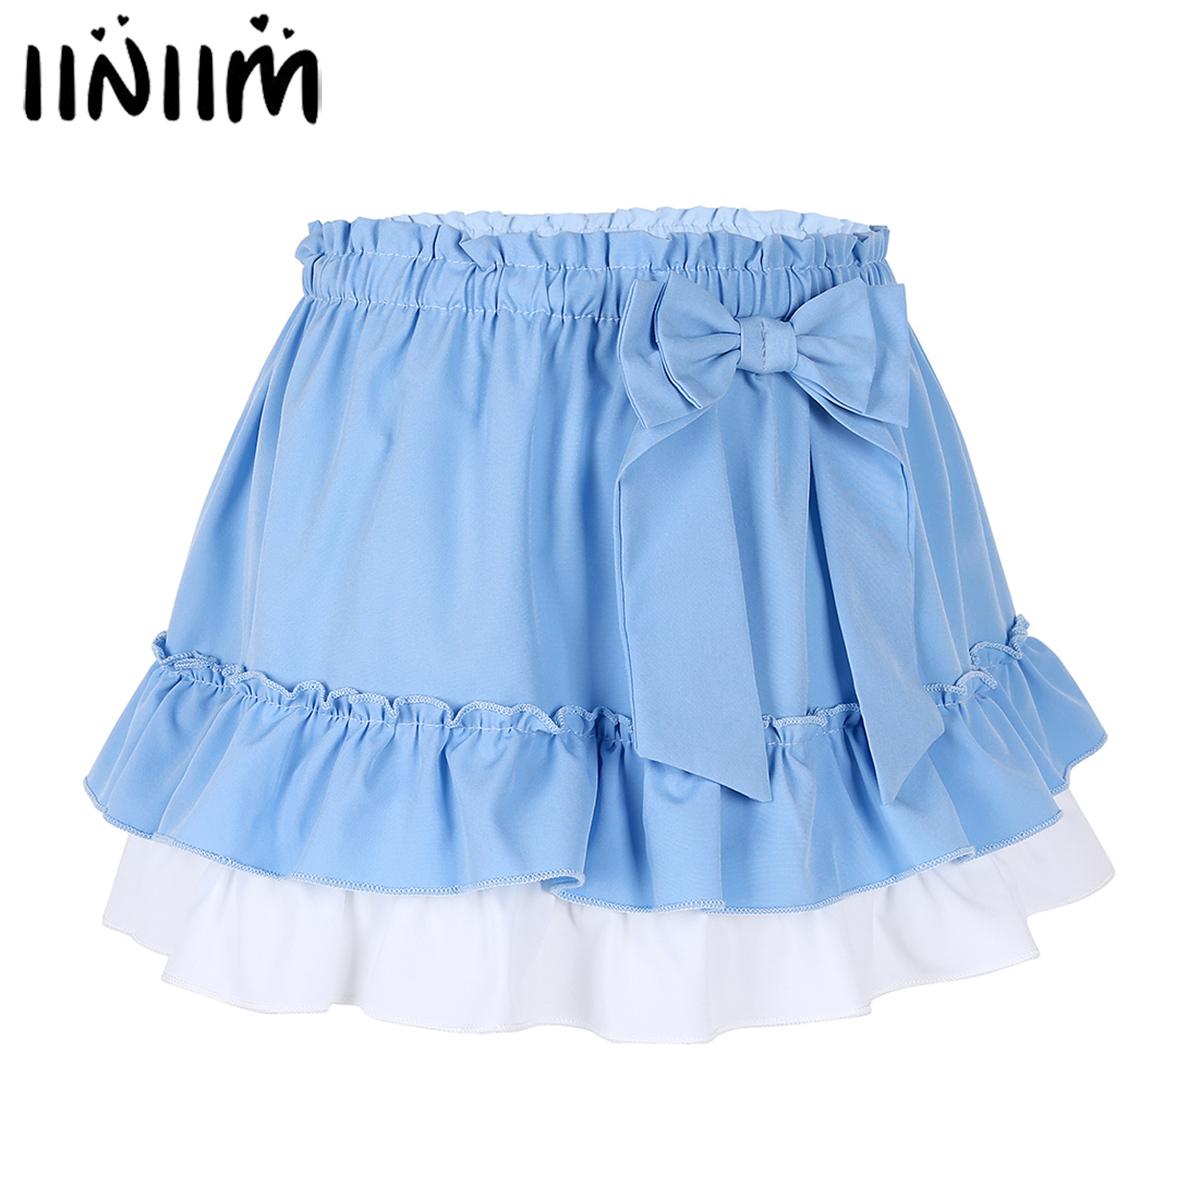 Women Mens Adult Sissy Skirt Pleated Gingham A-line Short Mini Dress Clubwear